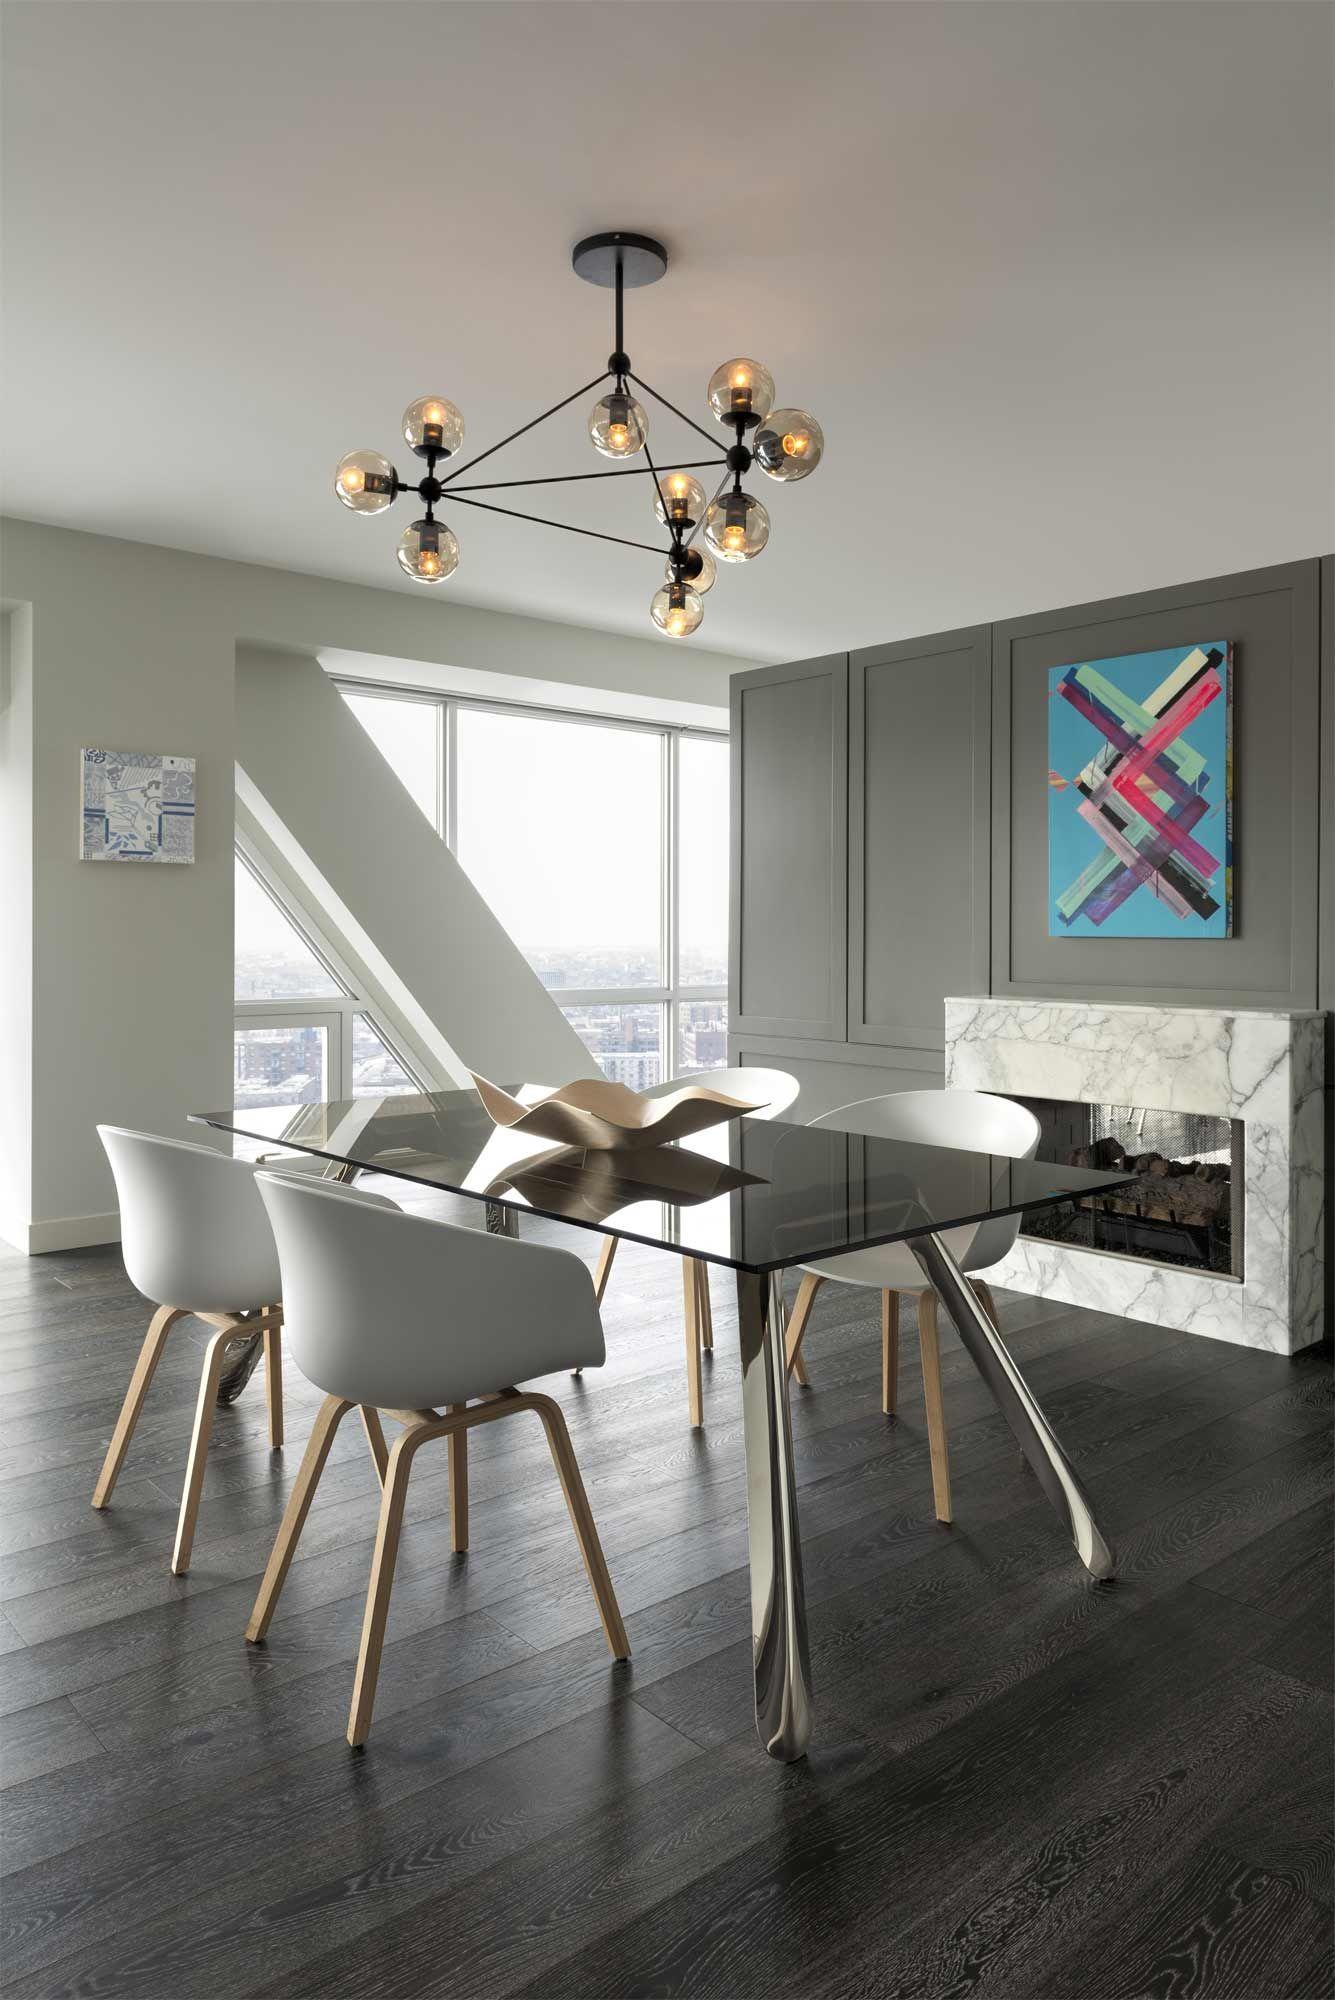 indoor lighting designer. Bola Suspension By Edge Lighting | Designer Credit: SK Design Group Indoor G